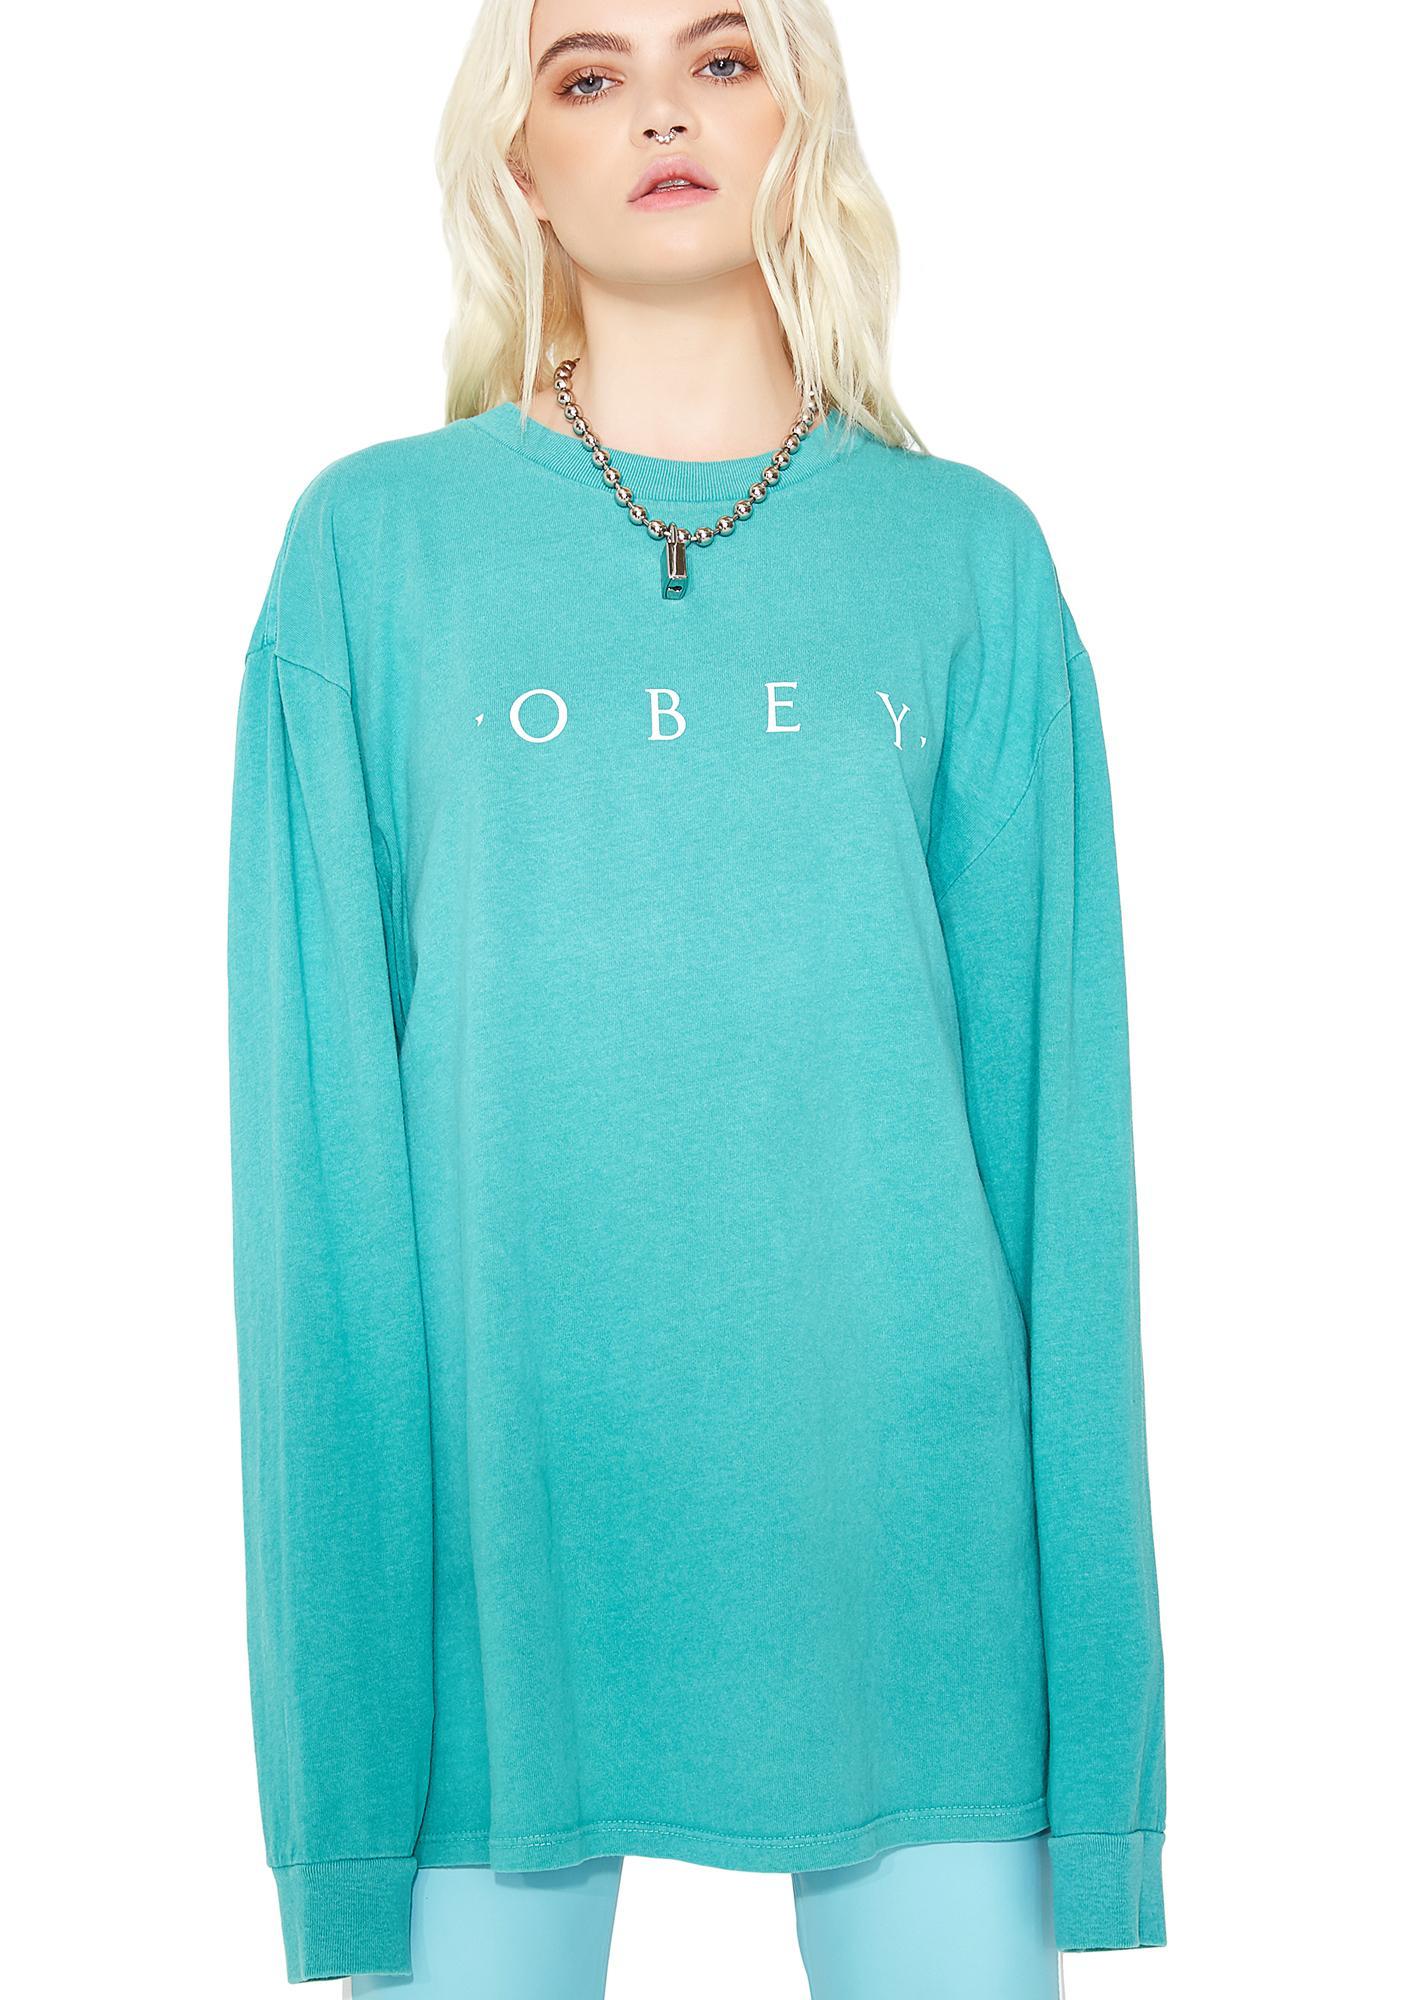 Obey Novel Obey Long Sleeve